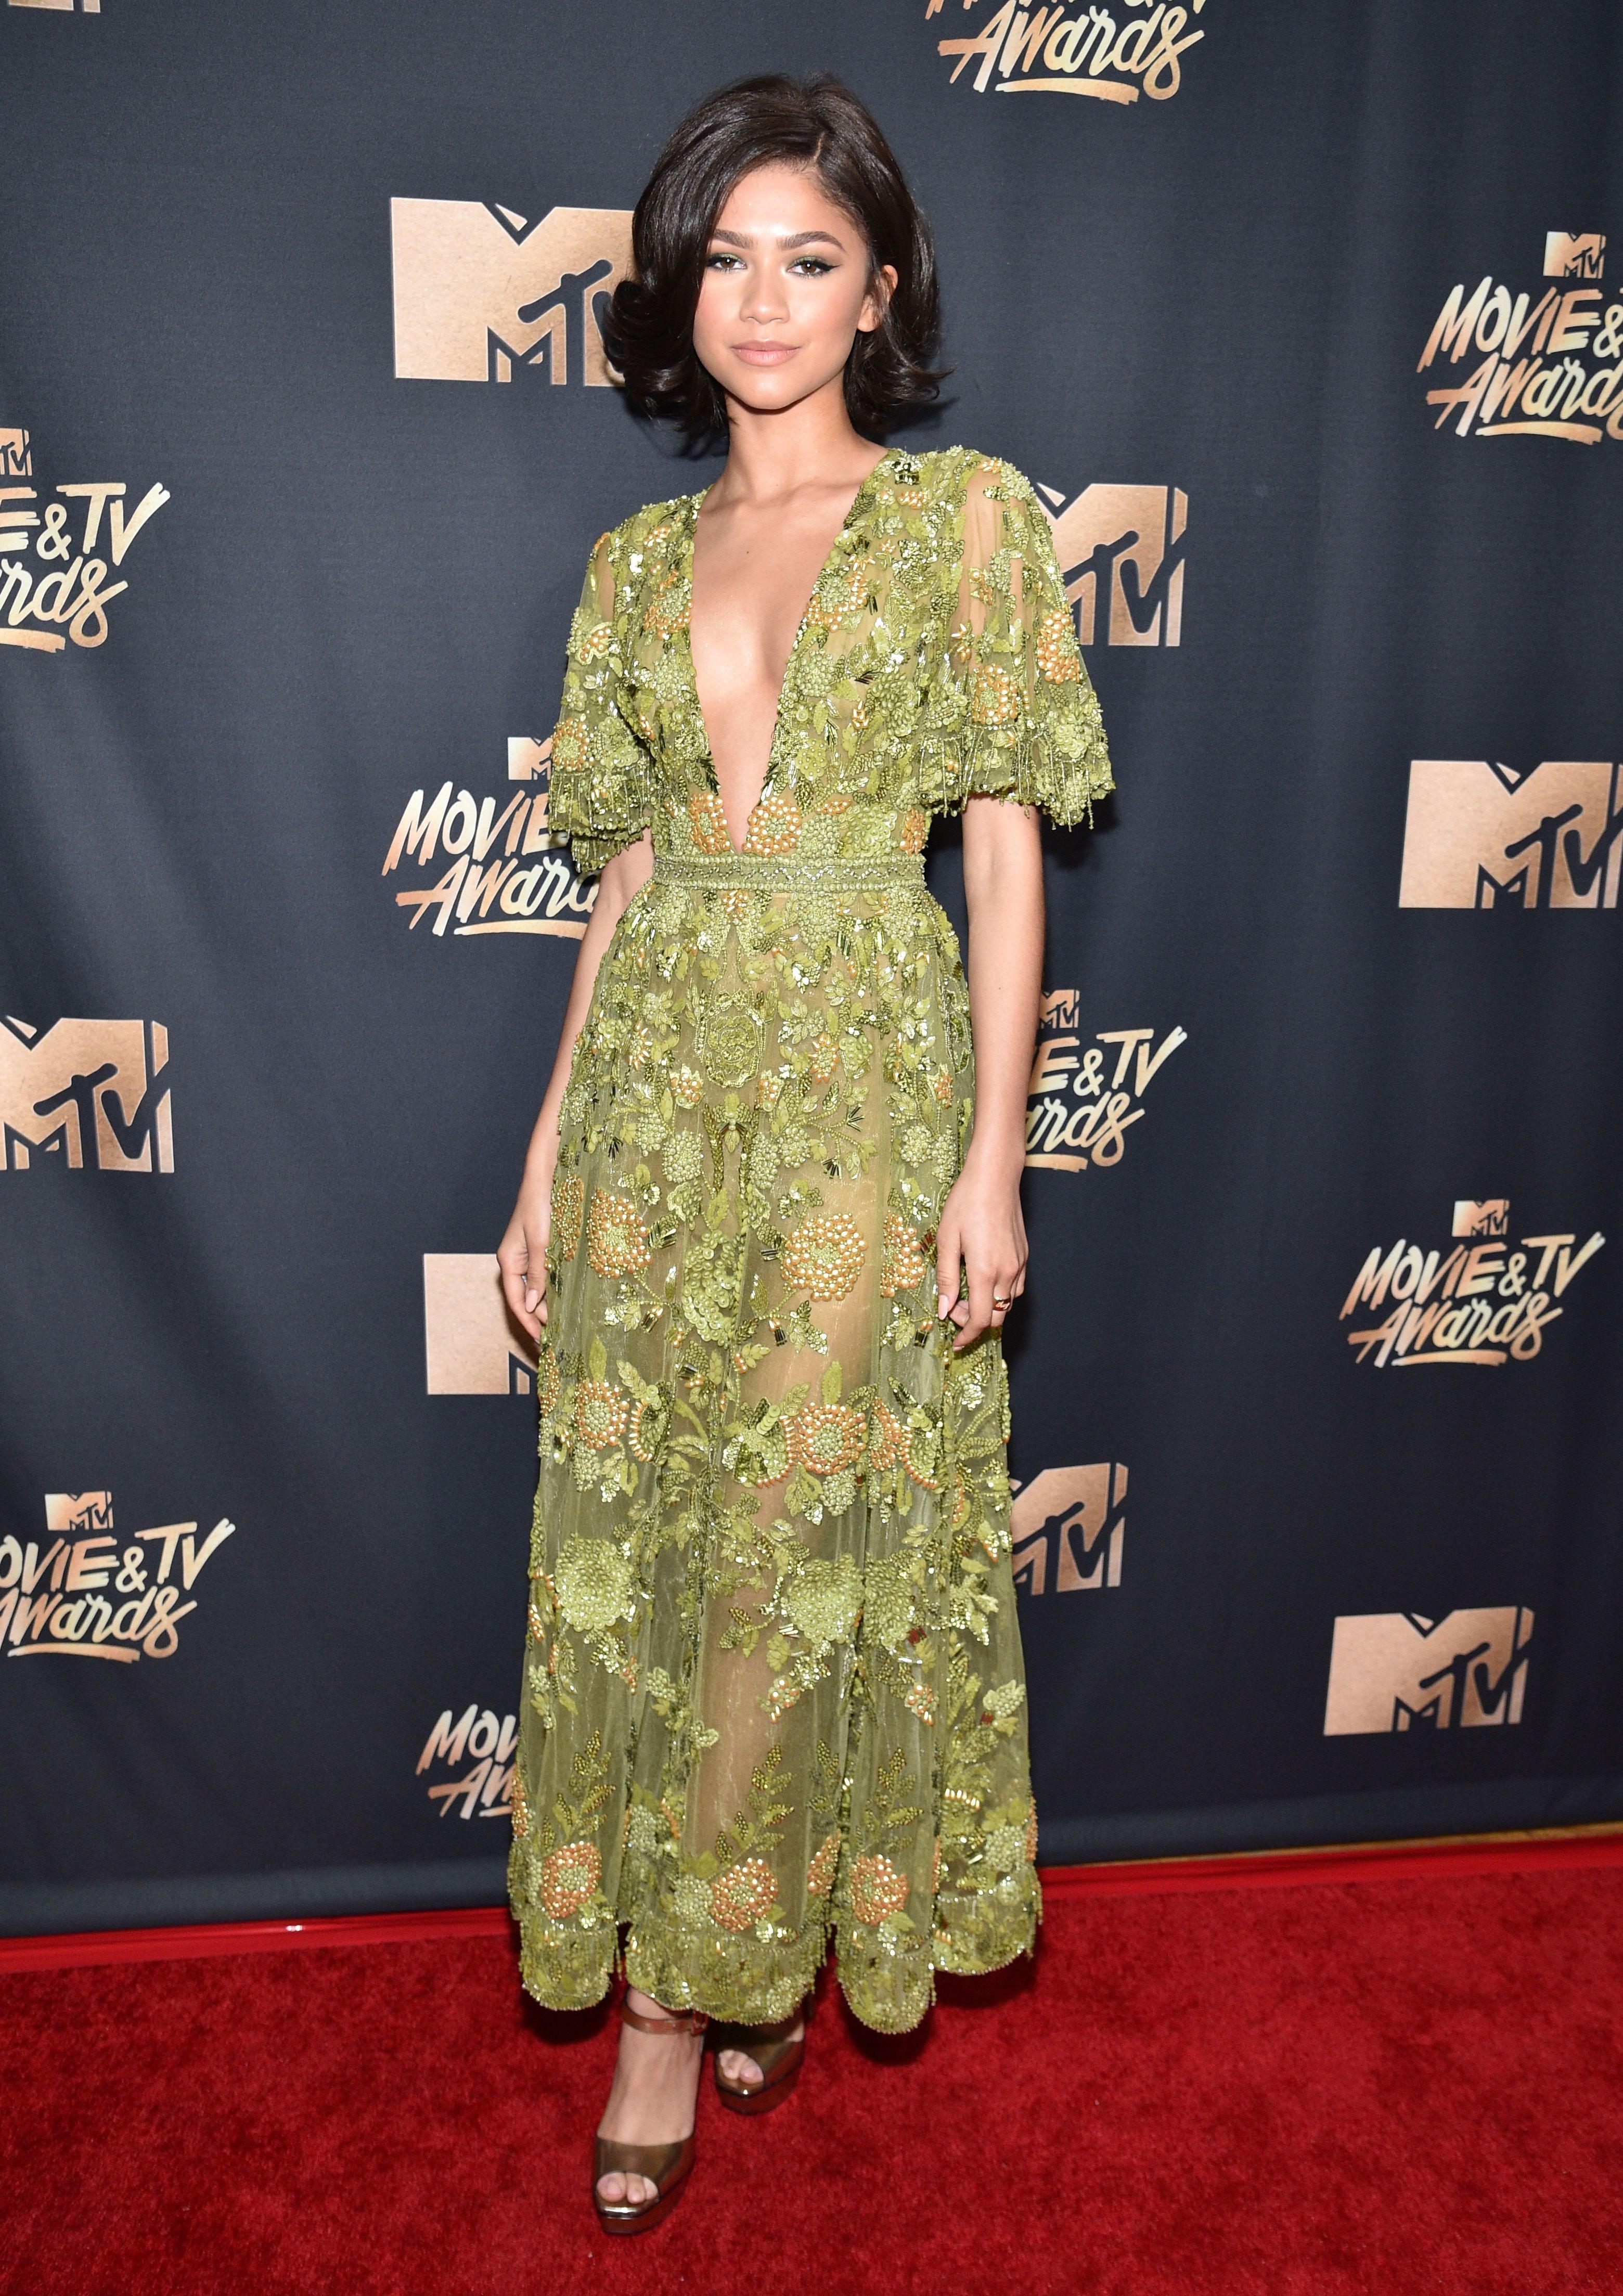 Mtv movie u tv awards red carpet fashion pinterest red carpet